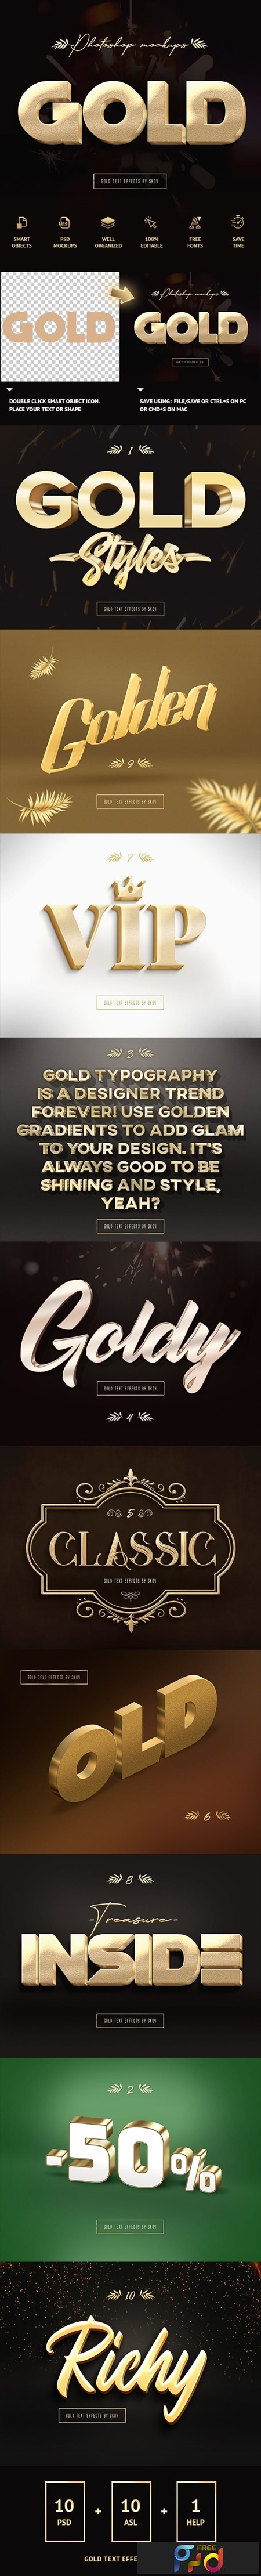 3D Gold Text Effects 23653176 1